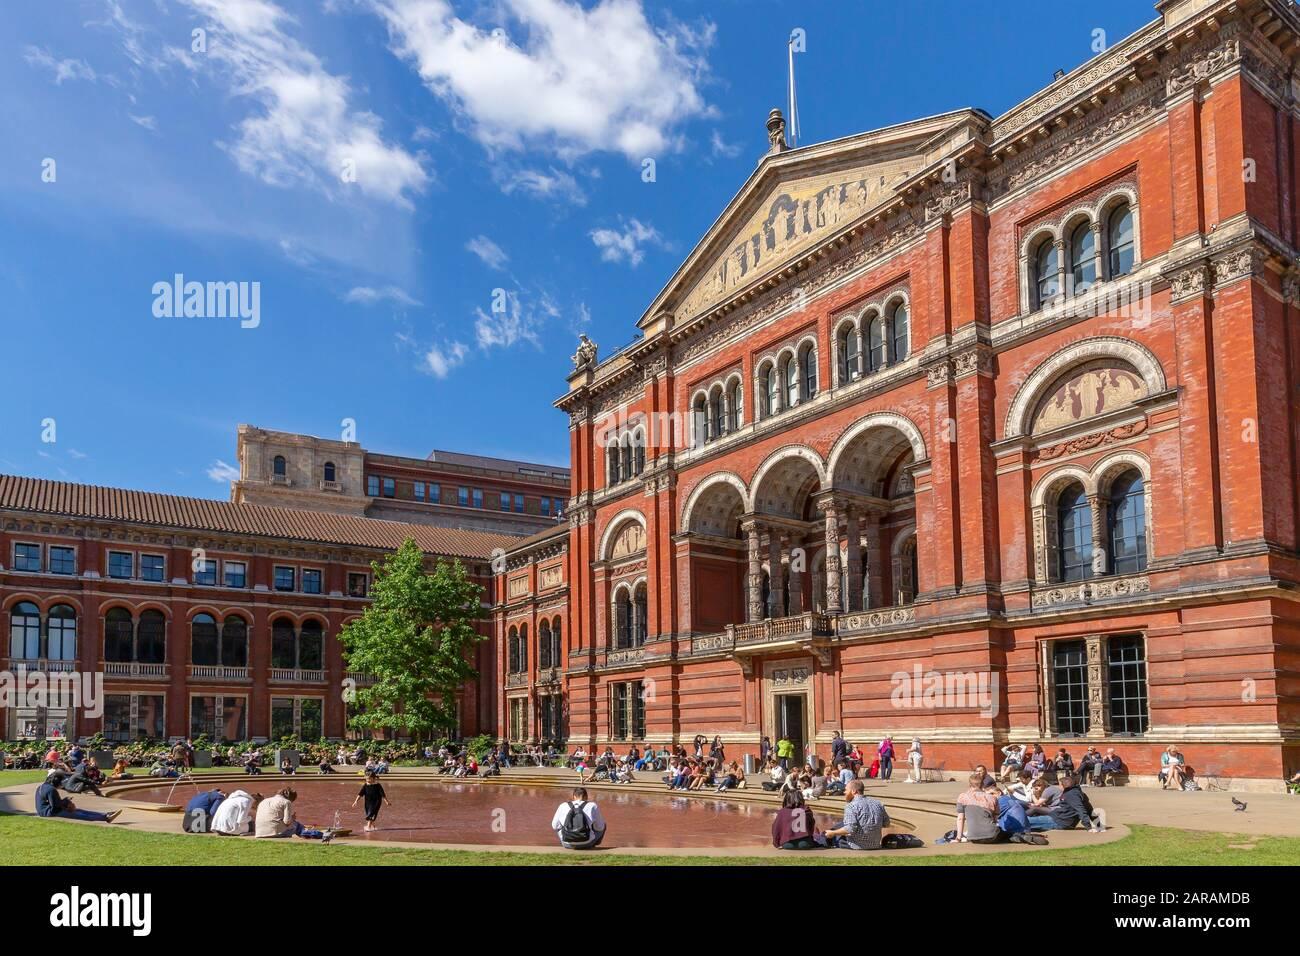 Tourists and visitors enjoy the John Madejski Garden, summer sunshine,  Victoria and Albert Museum, South Kensington, London,  England, UK, Europe Stock Photo